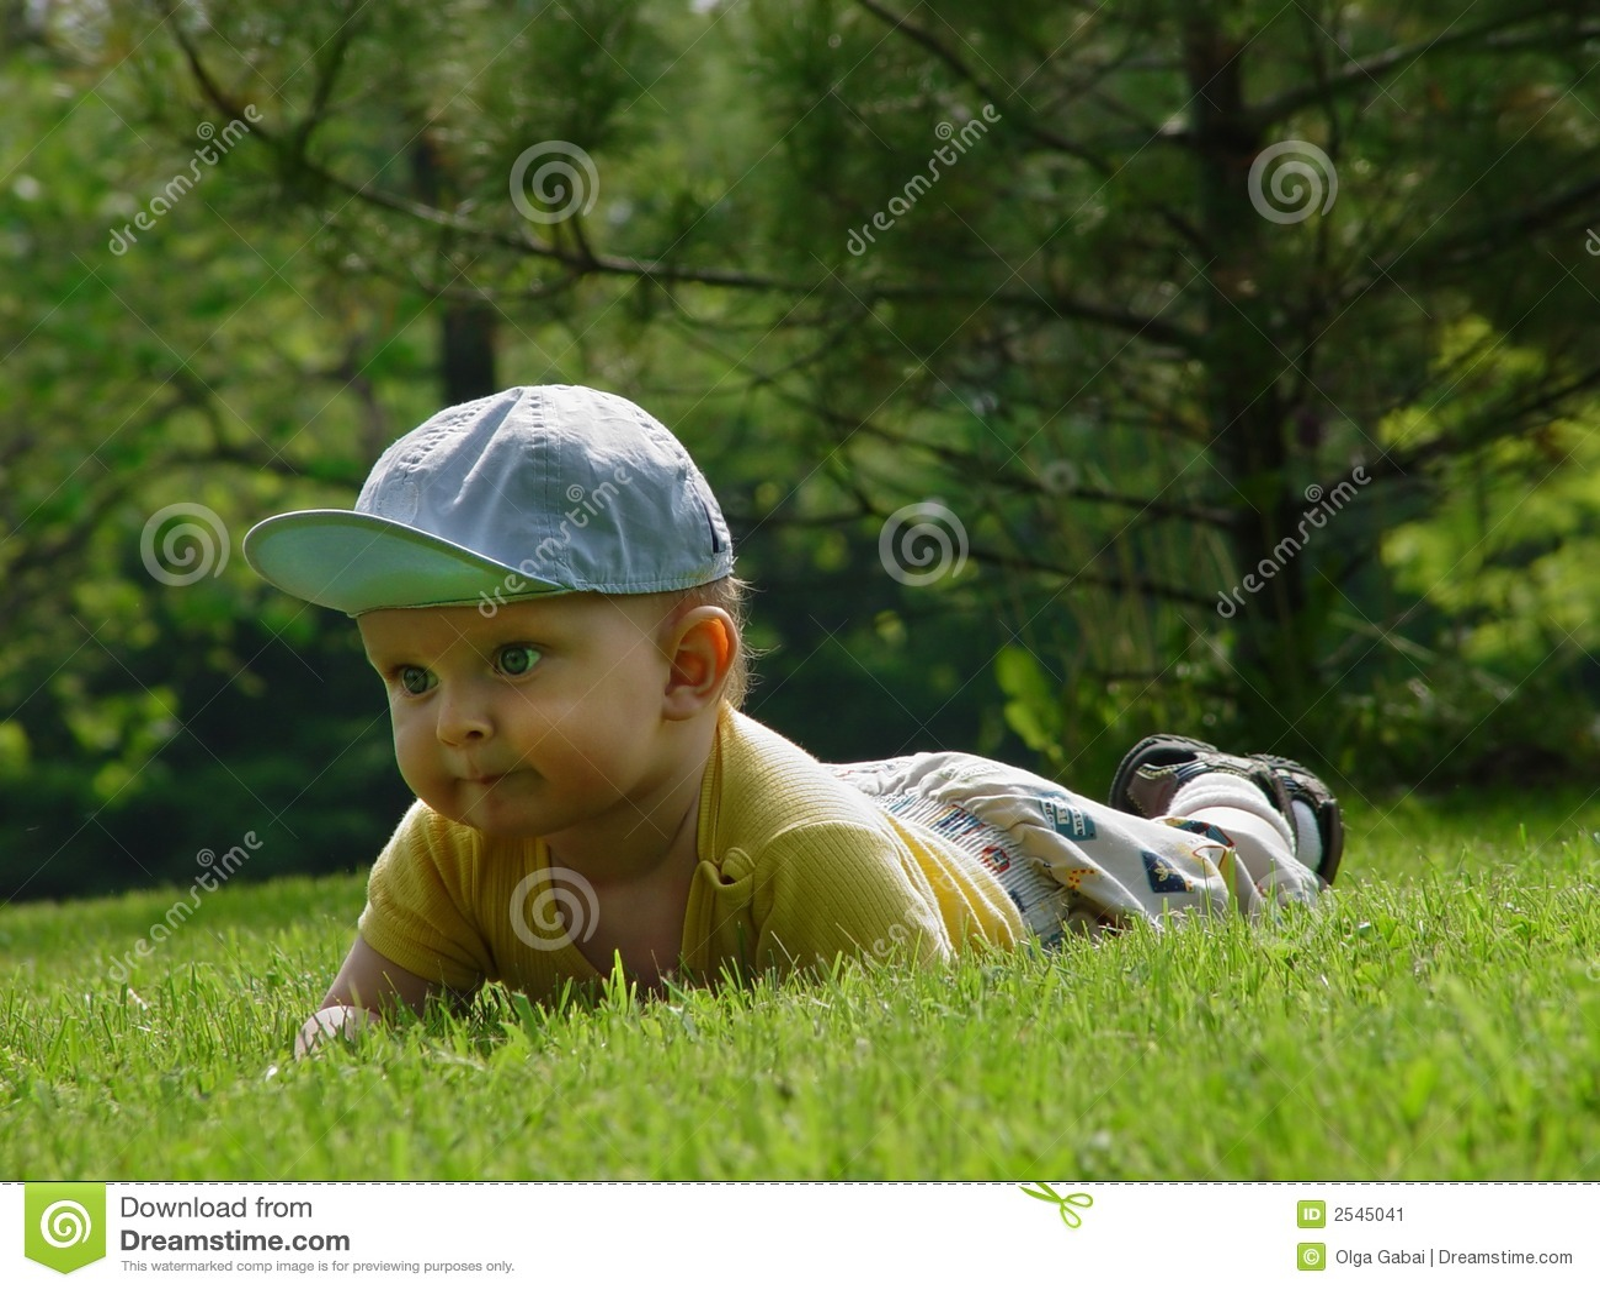 Little baby-boy on the grass